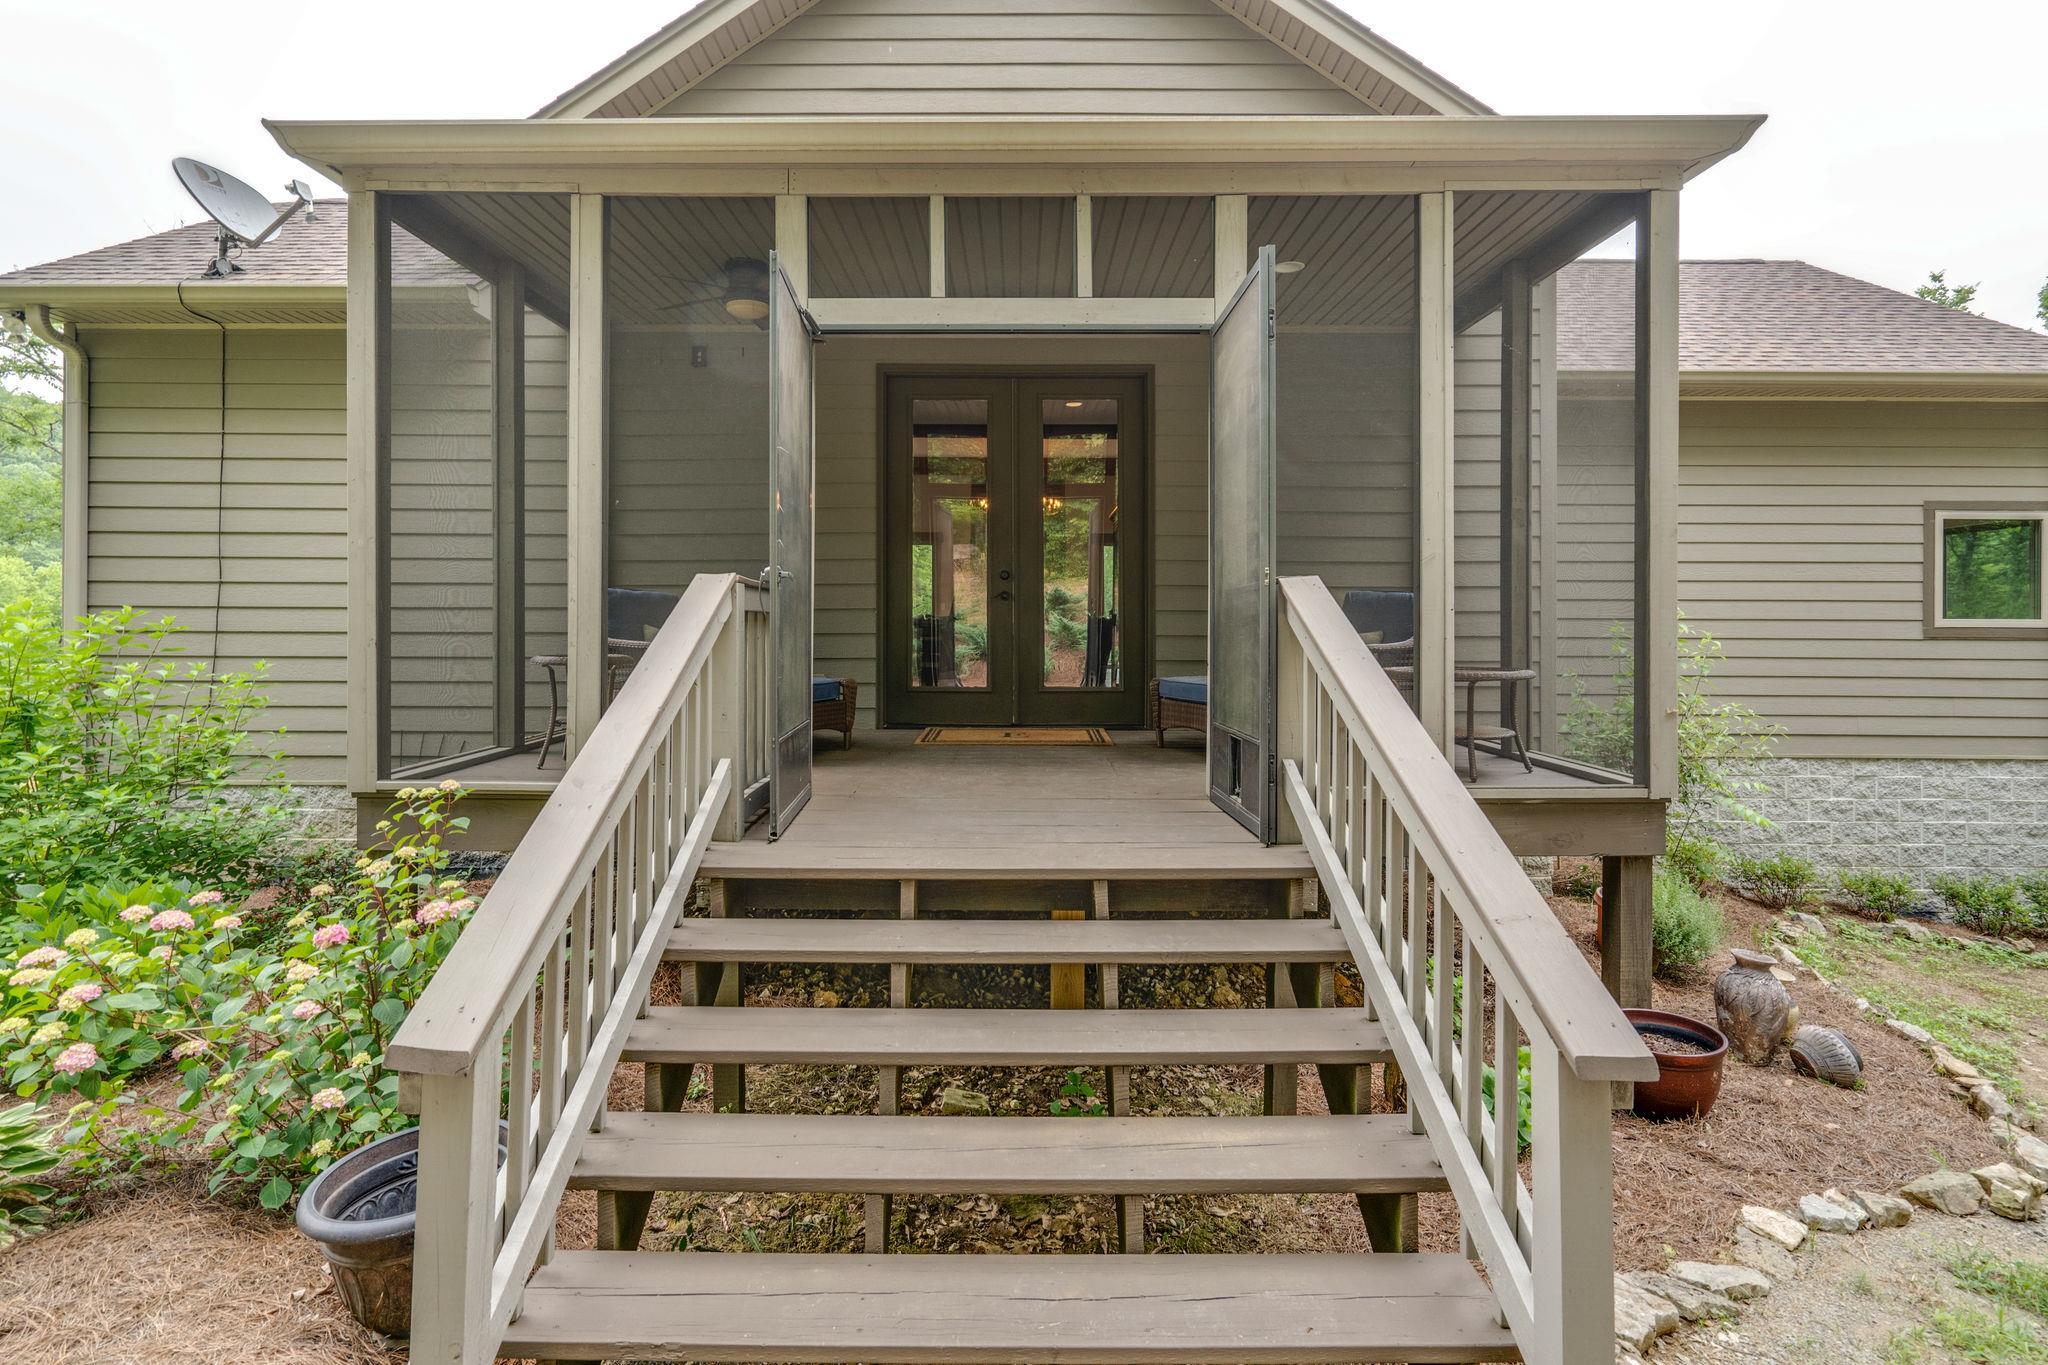 137 Gills Branch Ln, Gordonsville, TN 38563 - Gordonsville, TN real estate listing